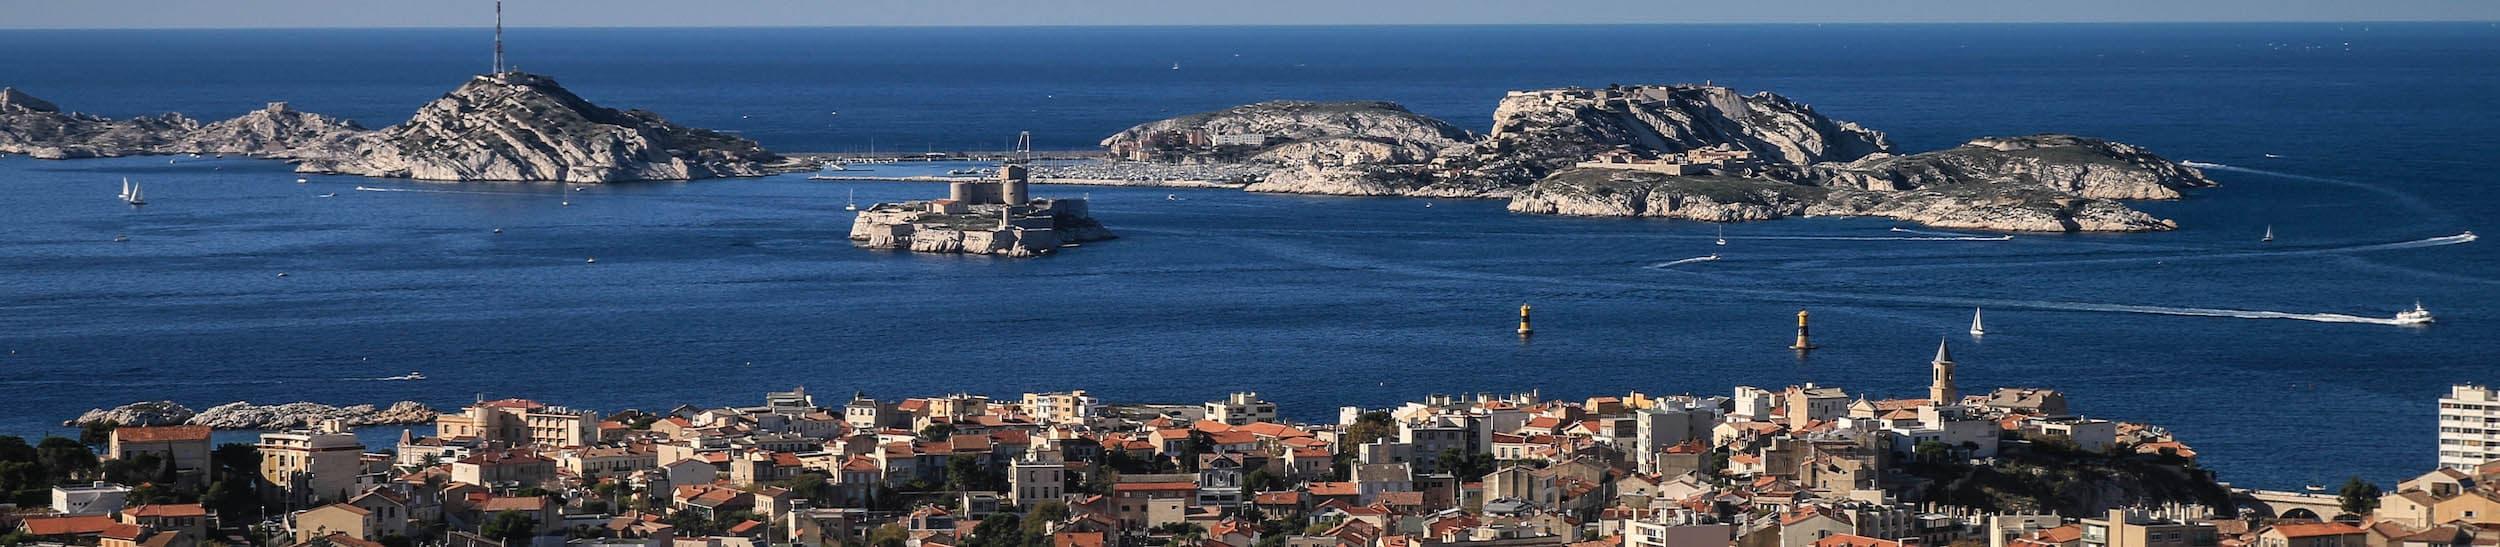 Skyline of Marseille